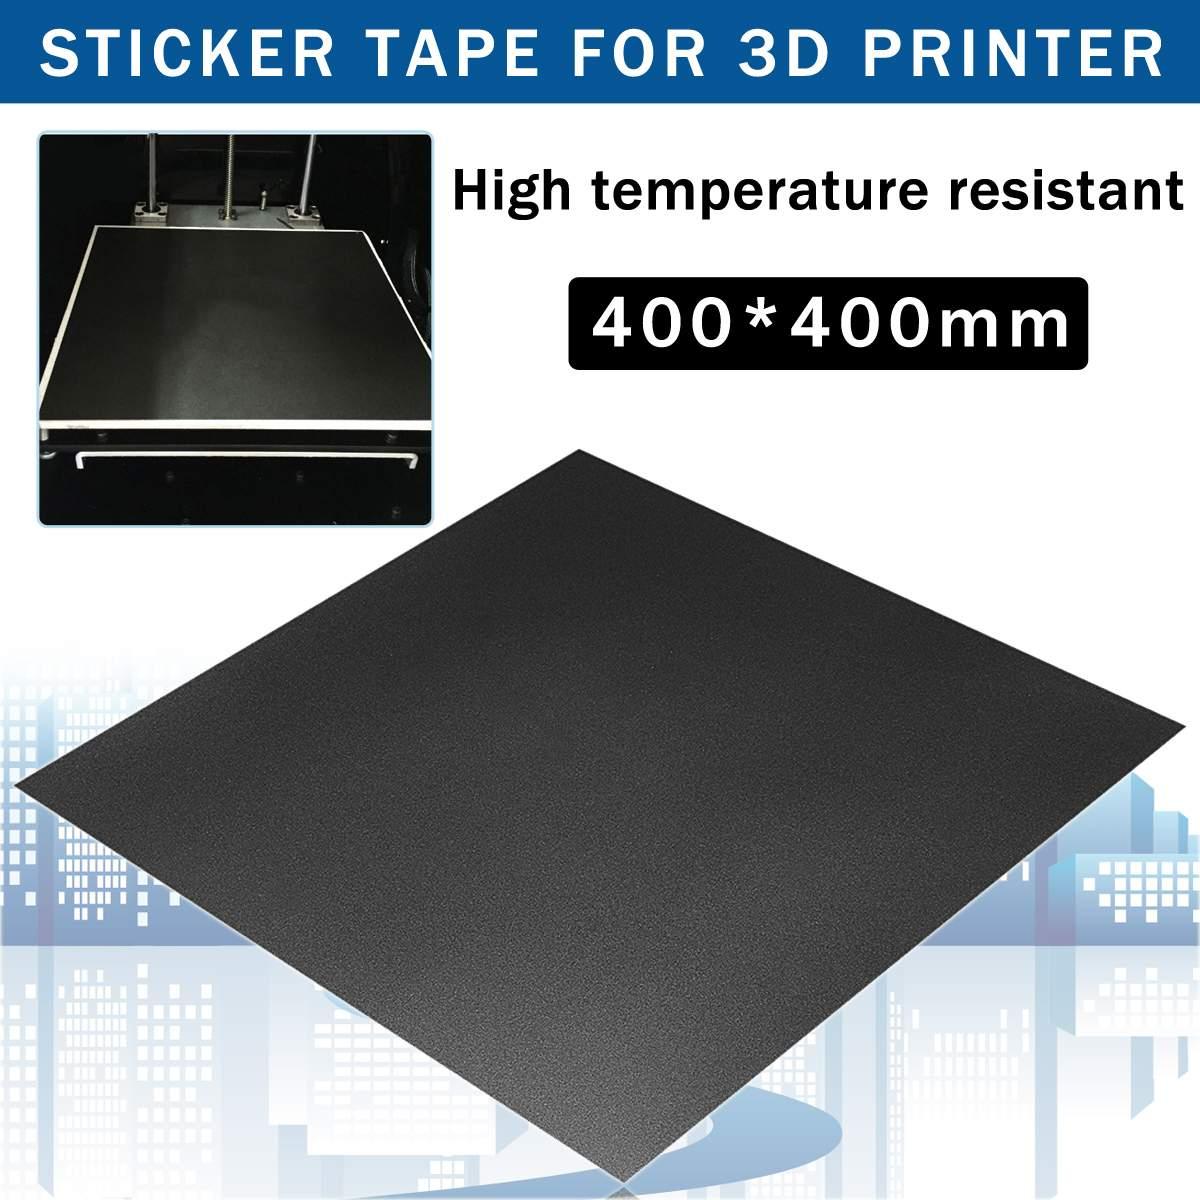 1Pcs Black 400 X 400mm Sticker Tape For 3D Printer Hot Bed Aluminum Plate Compound Plastic 15.75 X 15.75 Inch 3D Printer Parts